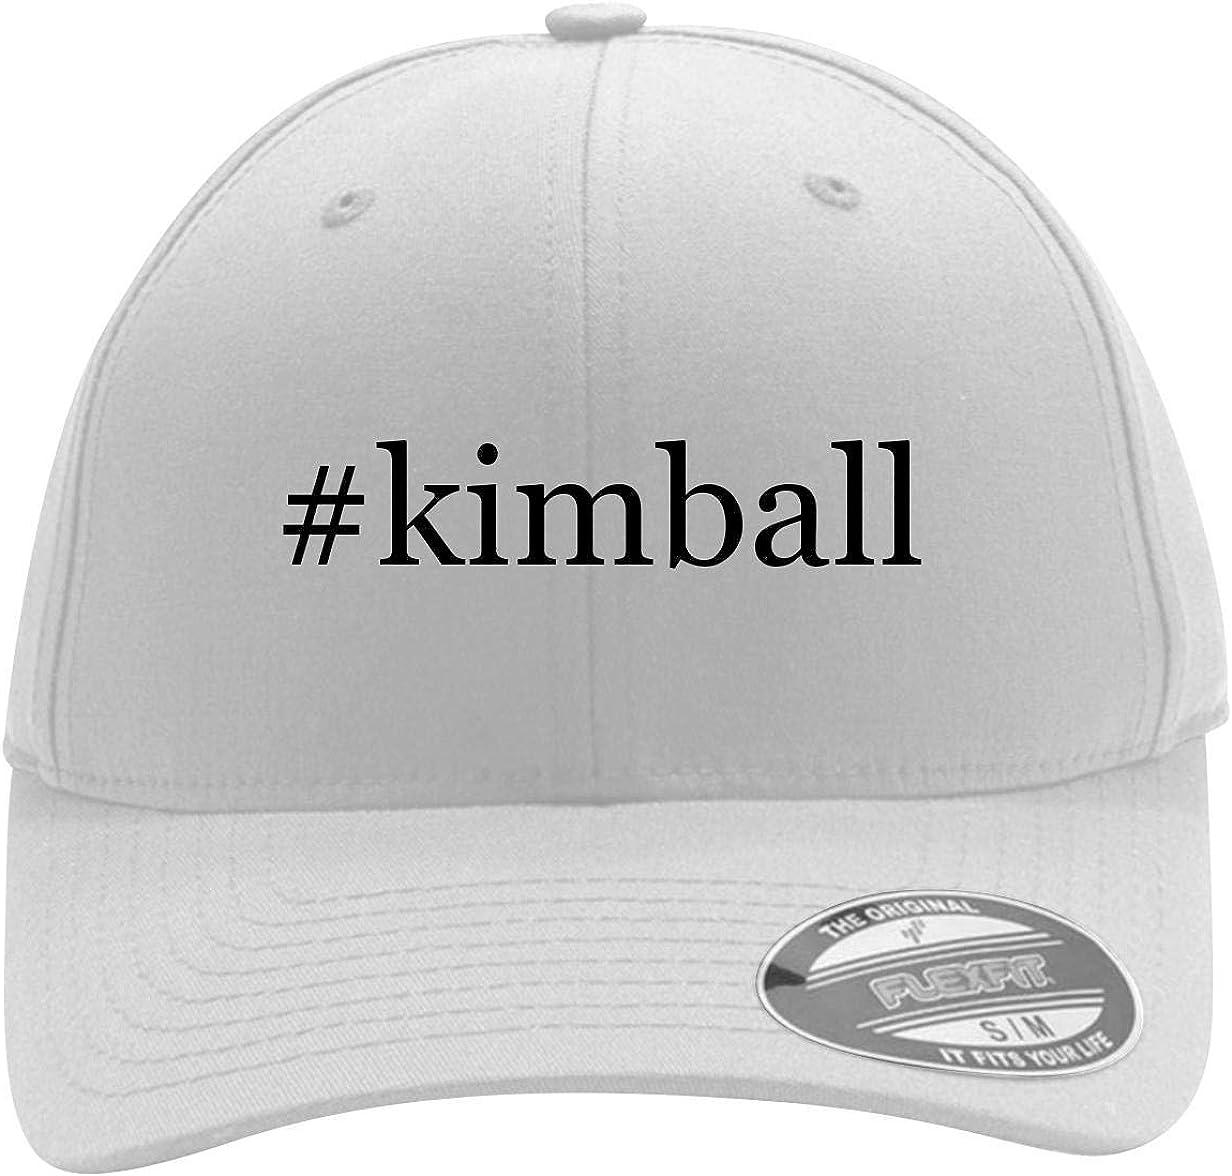 #Kimball - Men's Hashtag Flexfit Baseball Cap Hat